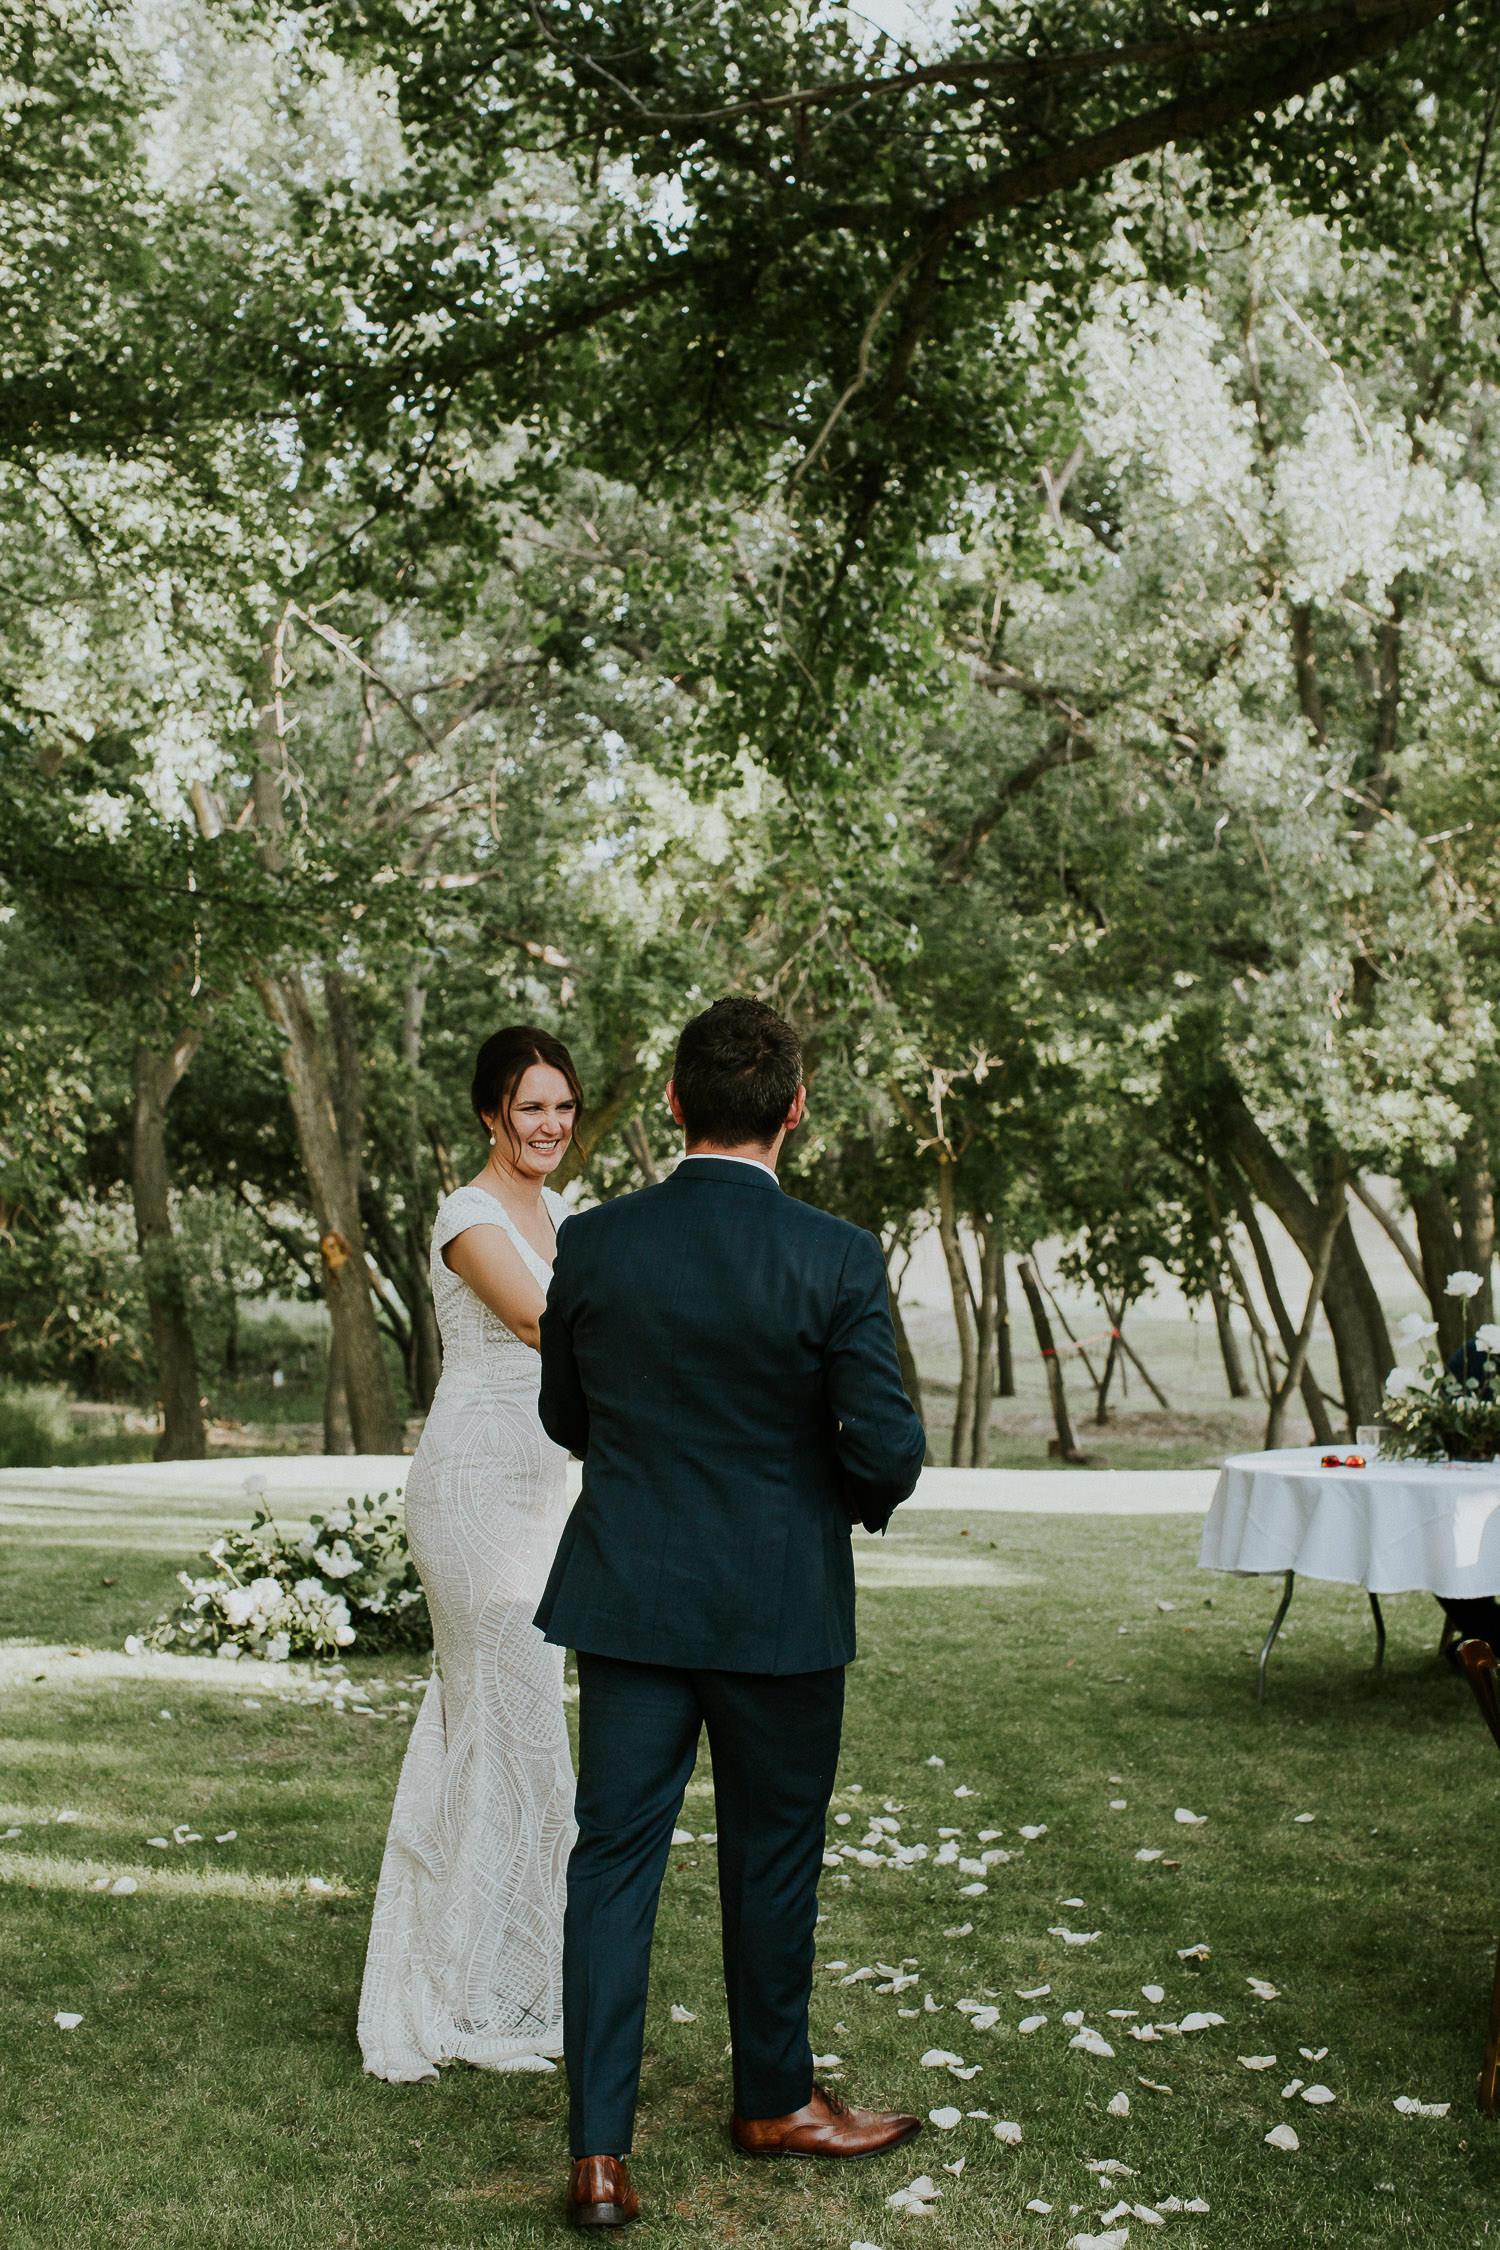 summer-backyard-wedding-in-alberta-sarah-pukin-0180